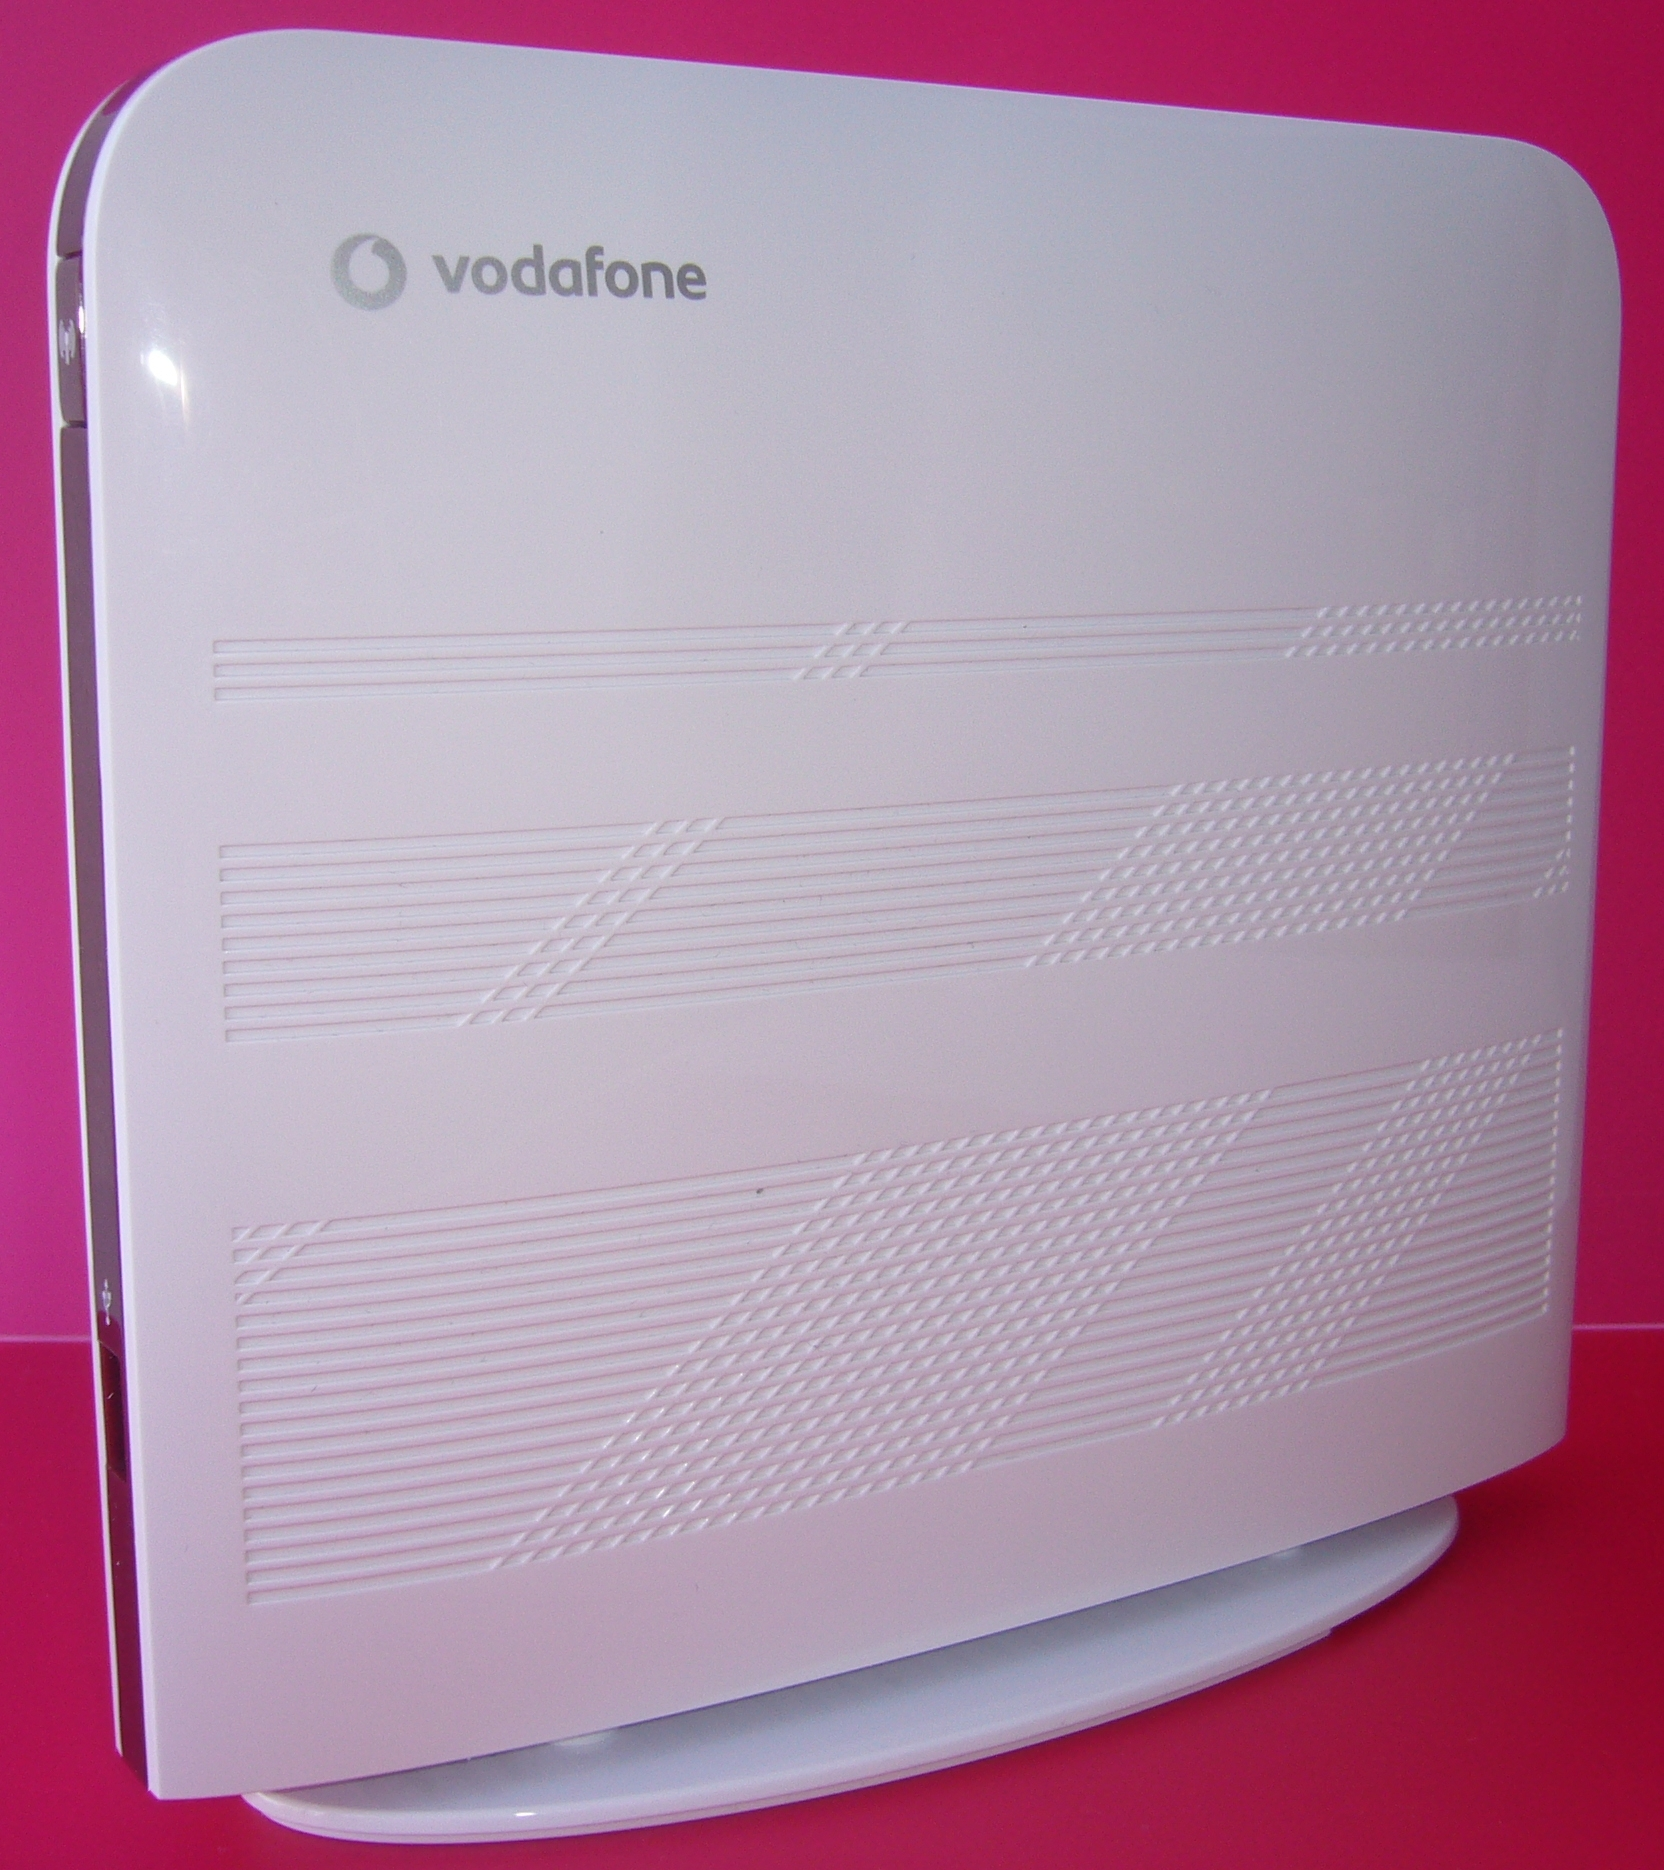 MODEM de VODAFONE HUAWEI HG 553 bwin 100 einzahlungsbonus HOME GATEWAY router HG553 aps24w-12v2a ...